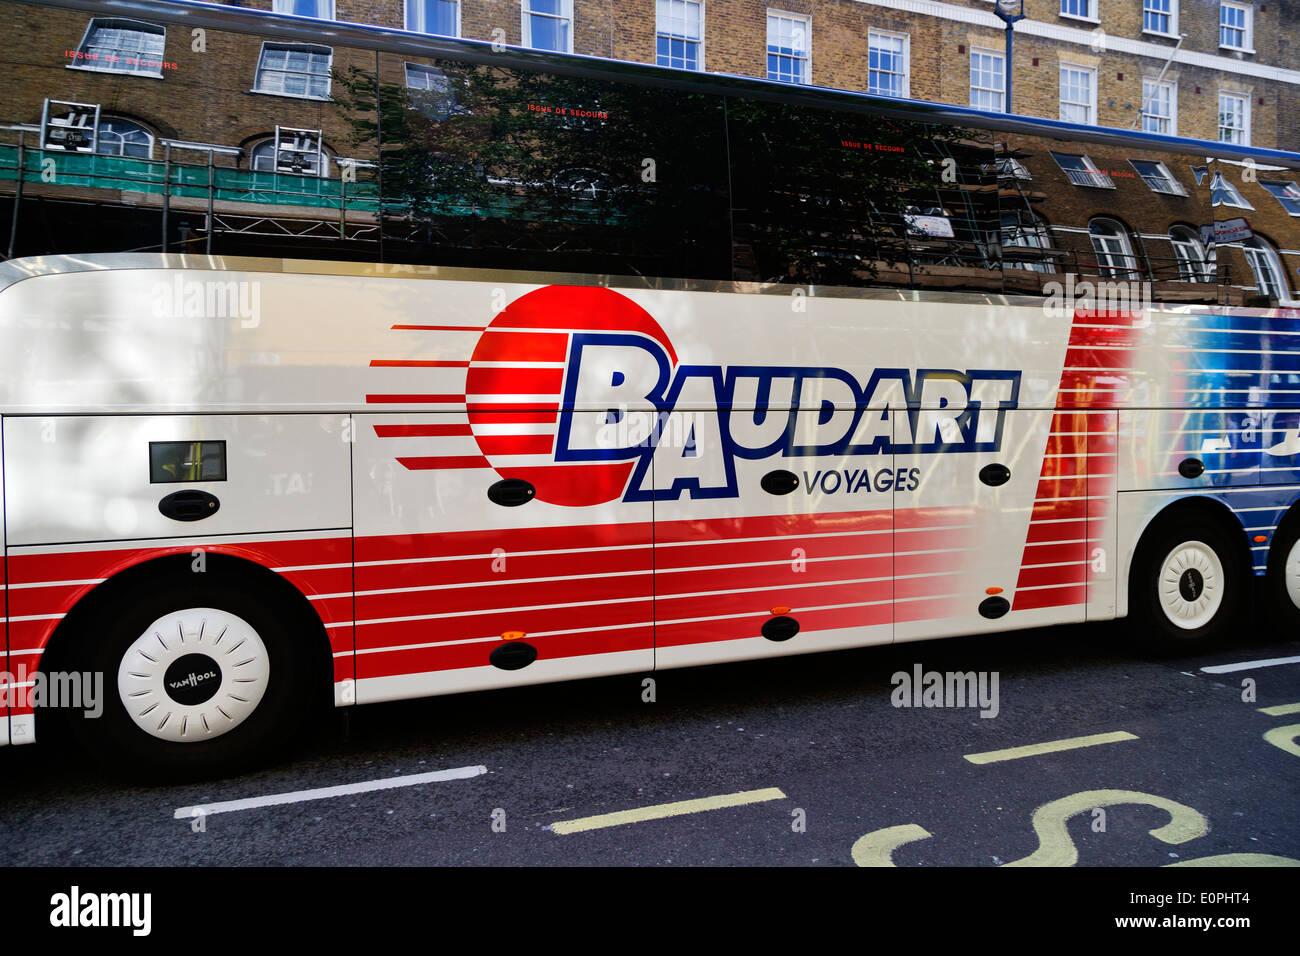 Tourist bus, Baudart Voyages, Baker Street, London, England, UK - Stock Image